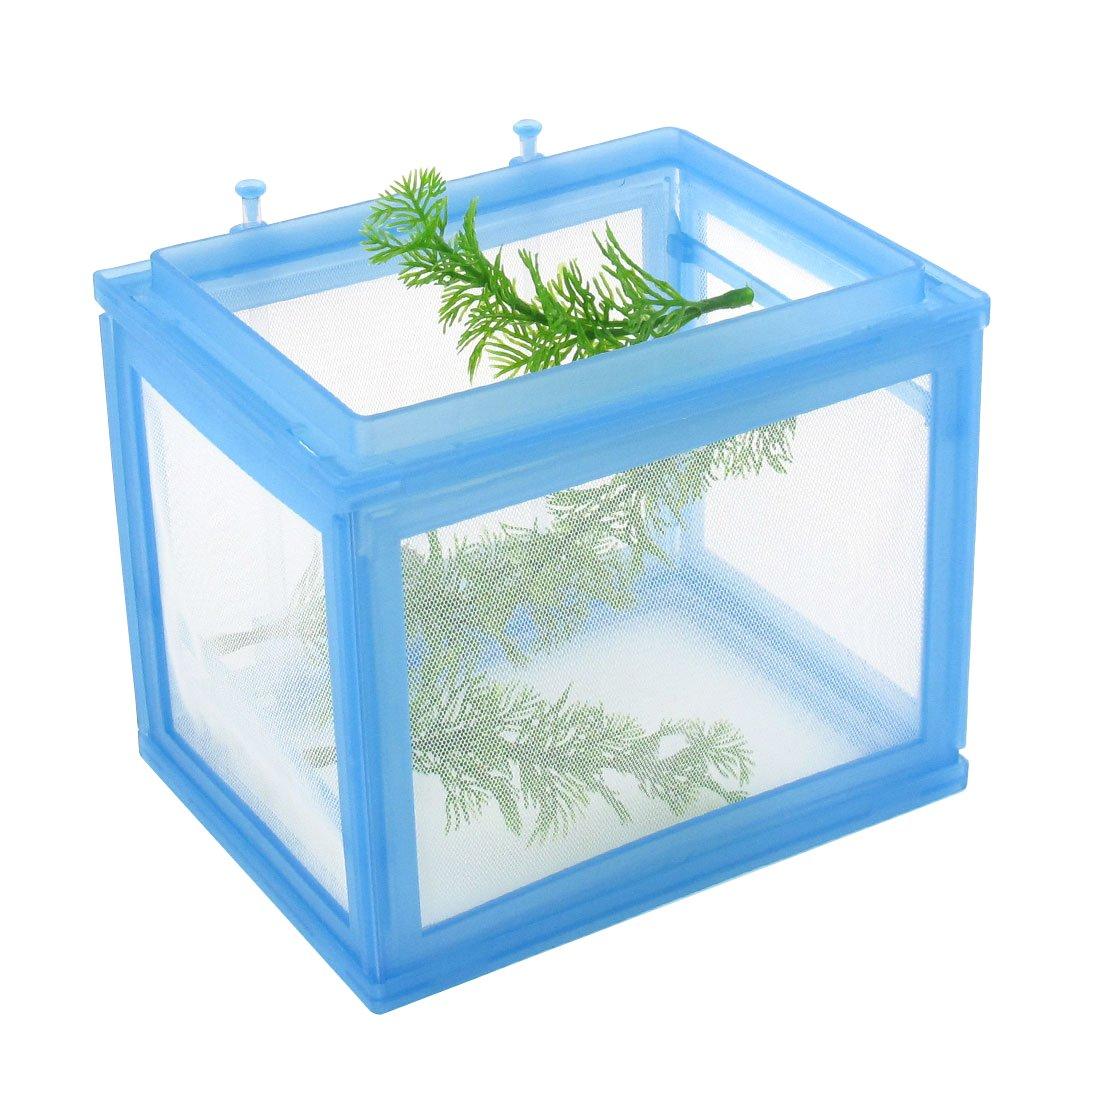 Uxcell Plastic Aqua Life Aquarium Fish Net Breeder Betta Baby Saver, Blue